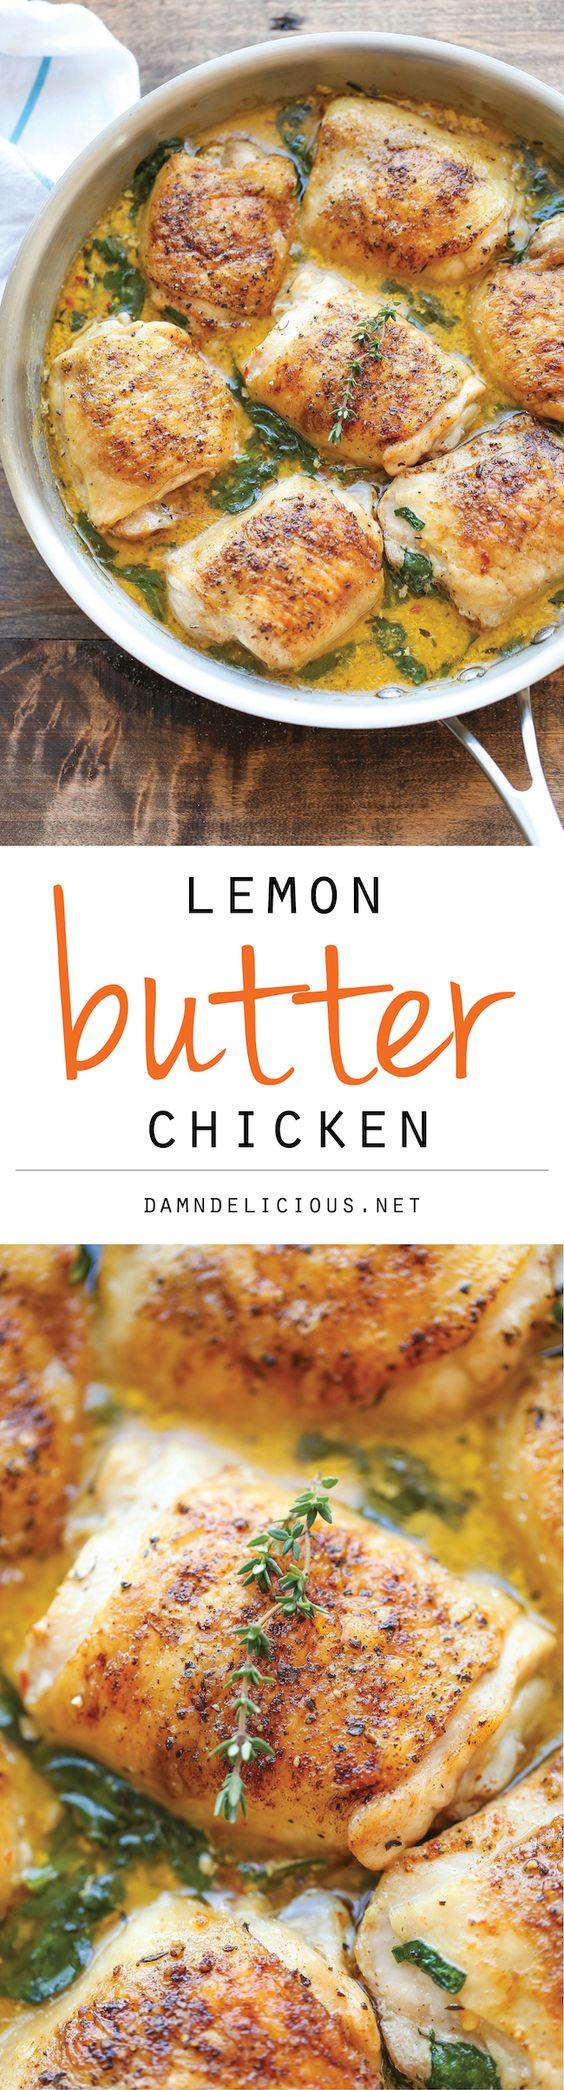 Lemon Butter Chicken - Easy crisp-tender chicken with the creamiest lemon butter sauce ever - Sauce: garlic, chicken broth, heavy cream, Parmesan, lemon juice and thyme. yum - 2 net carbs/serving